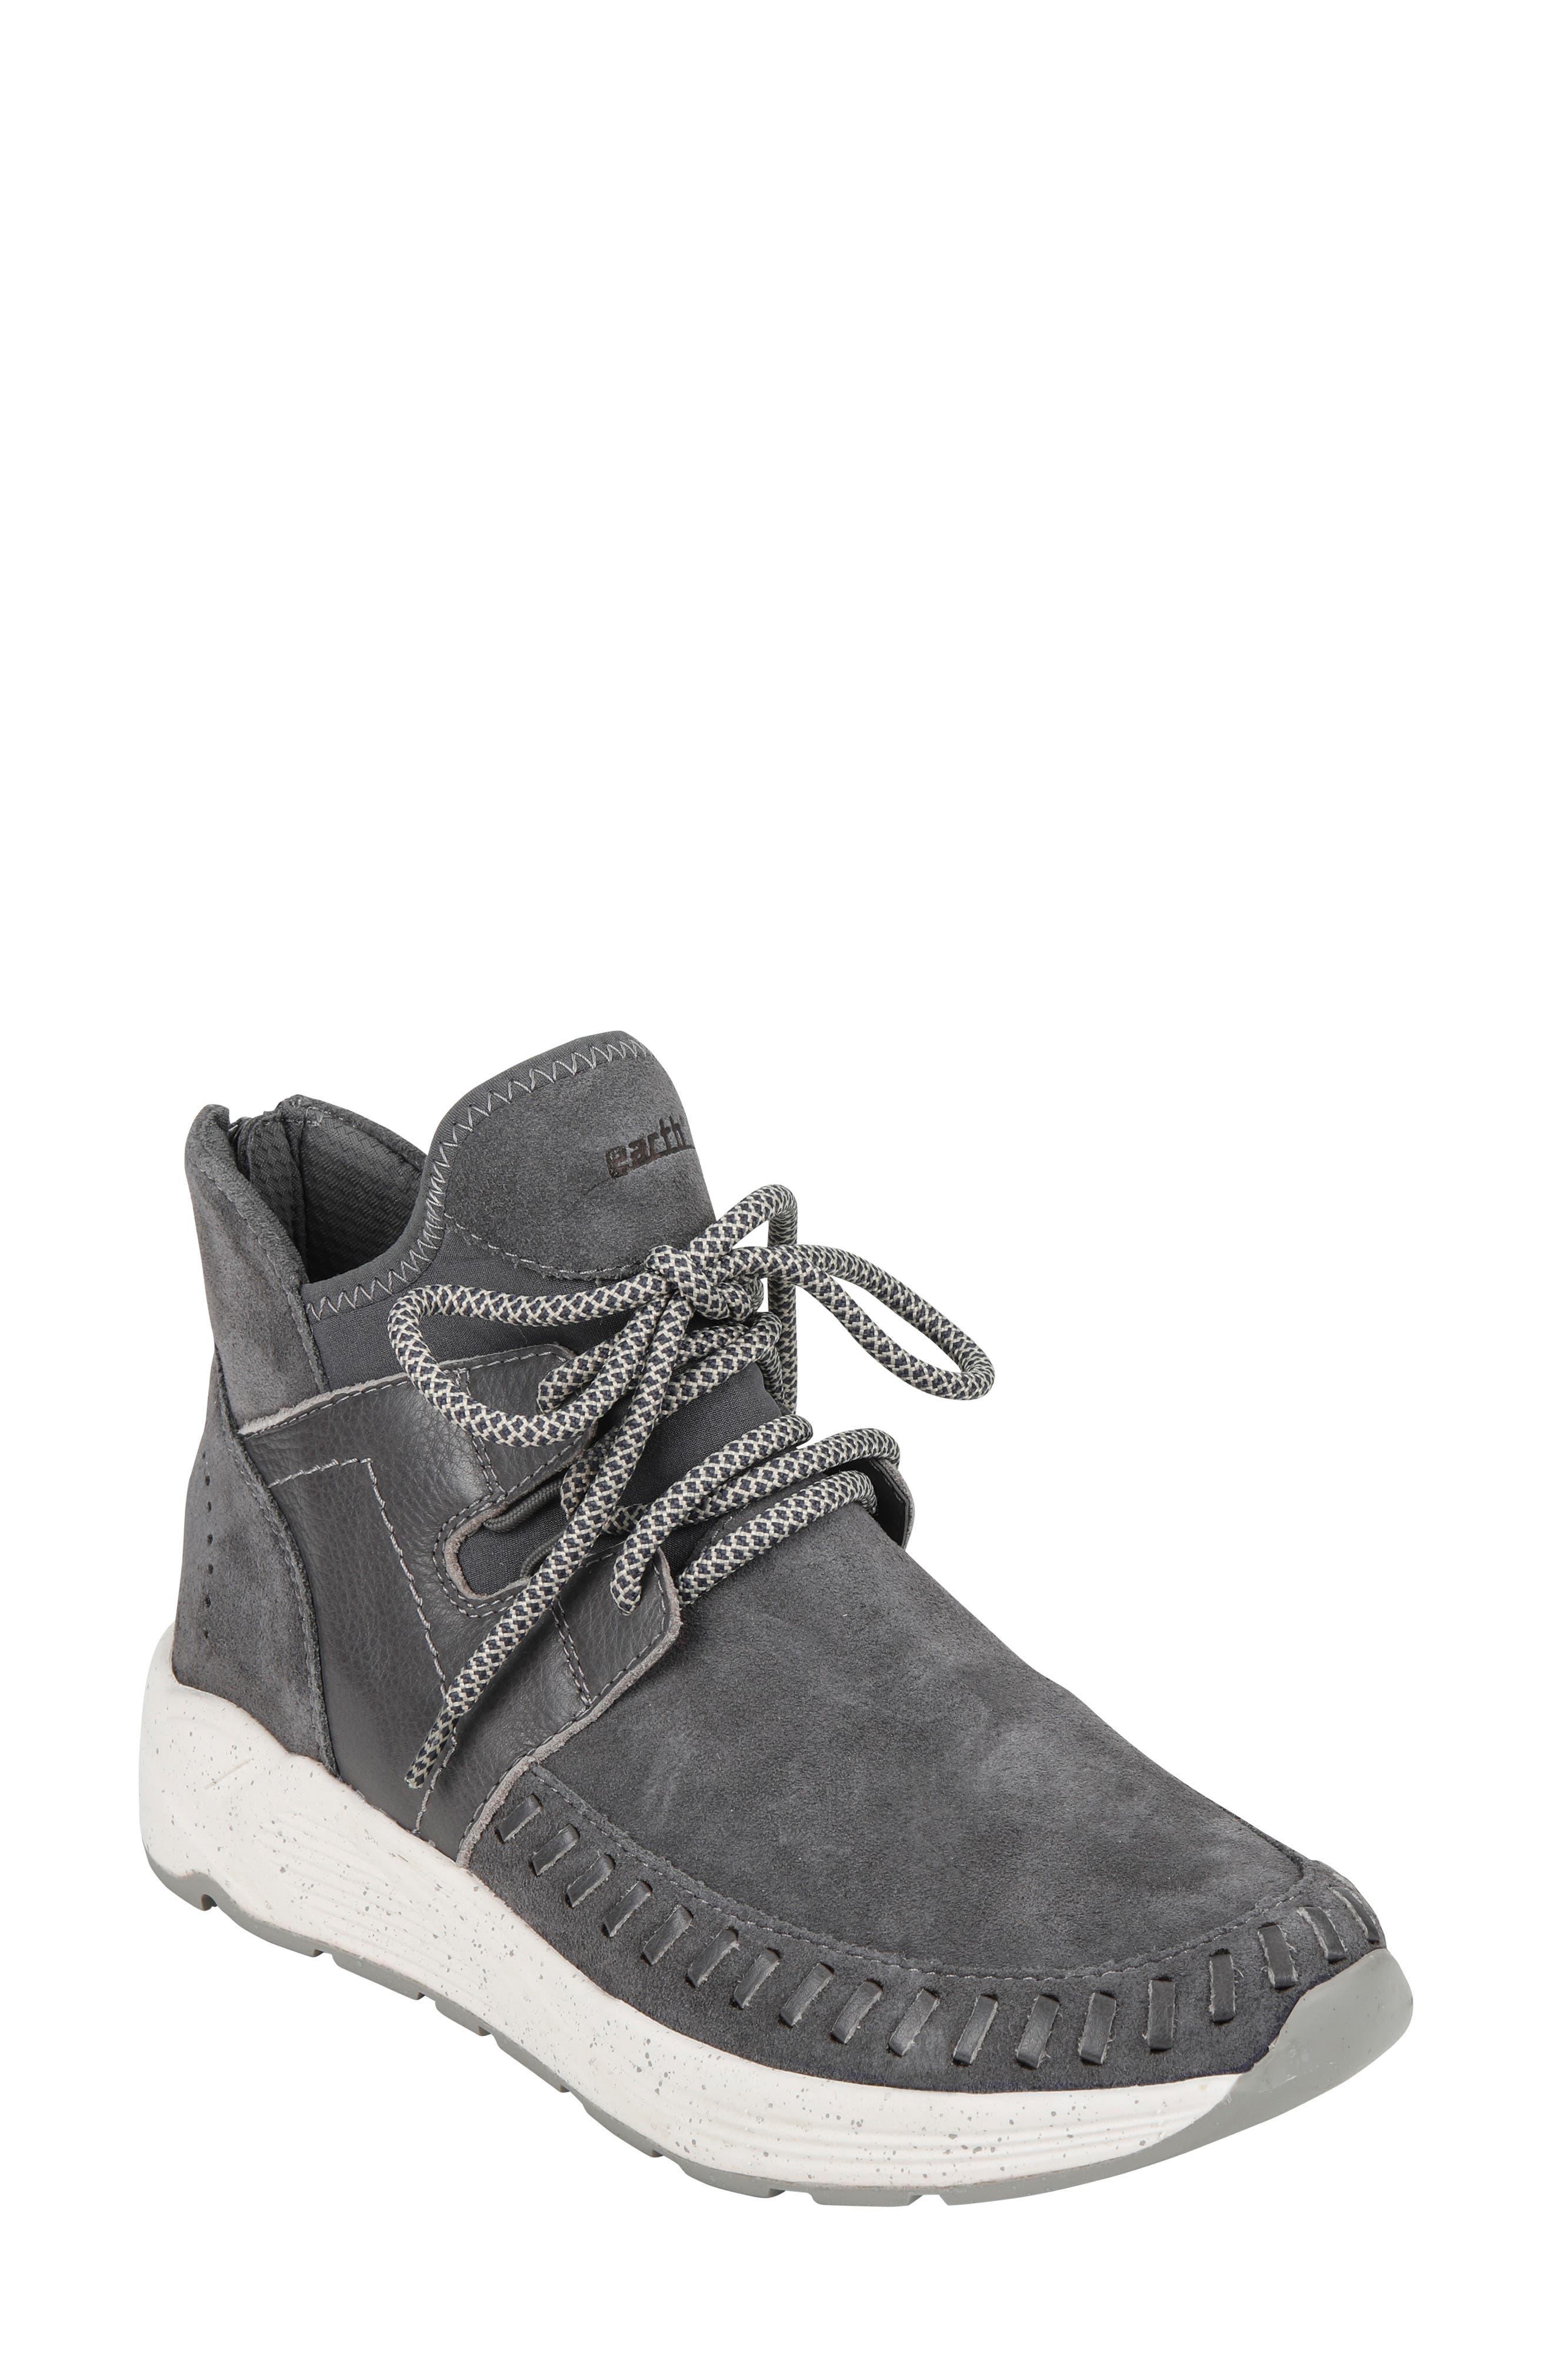 Earth Jaunt Sneaker, Grey